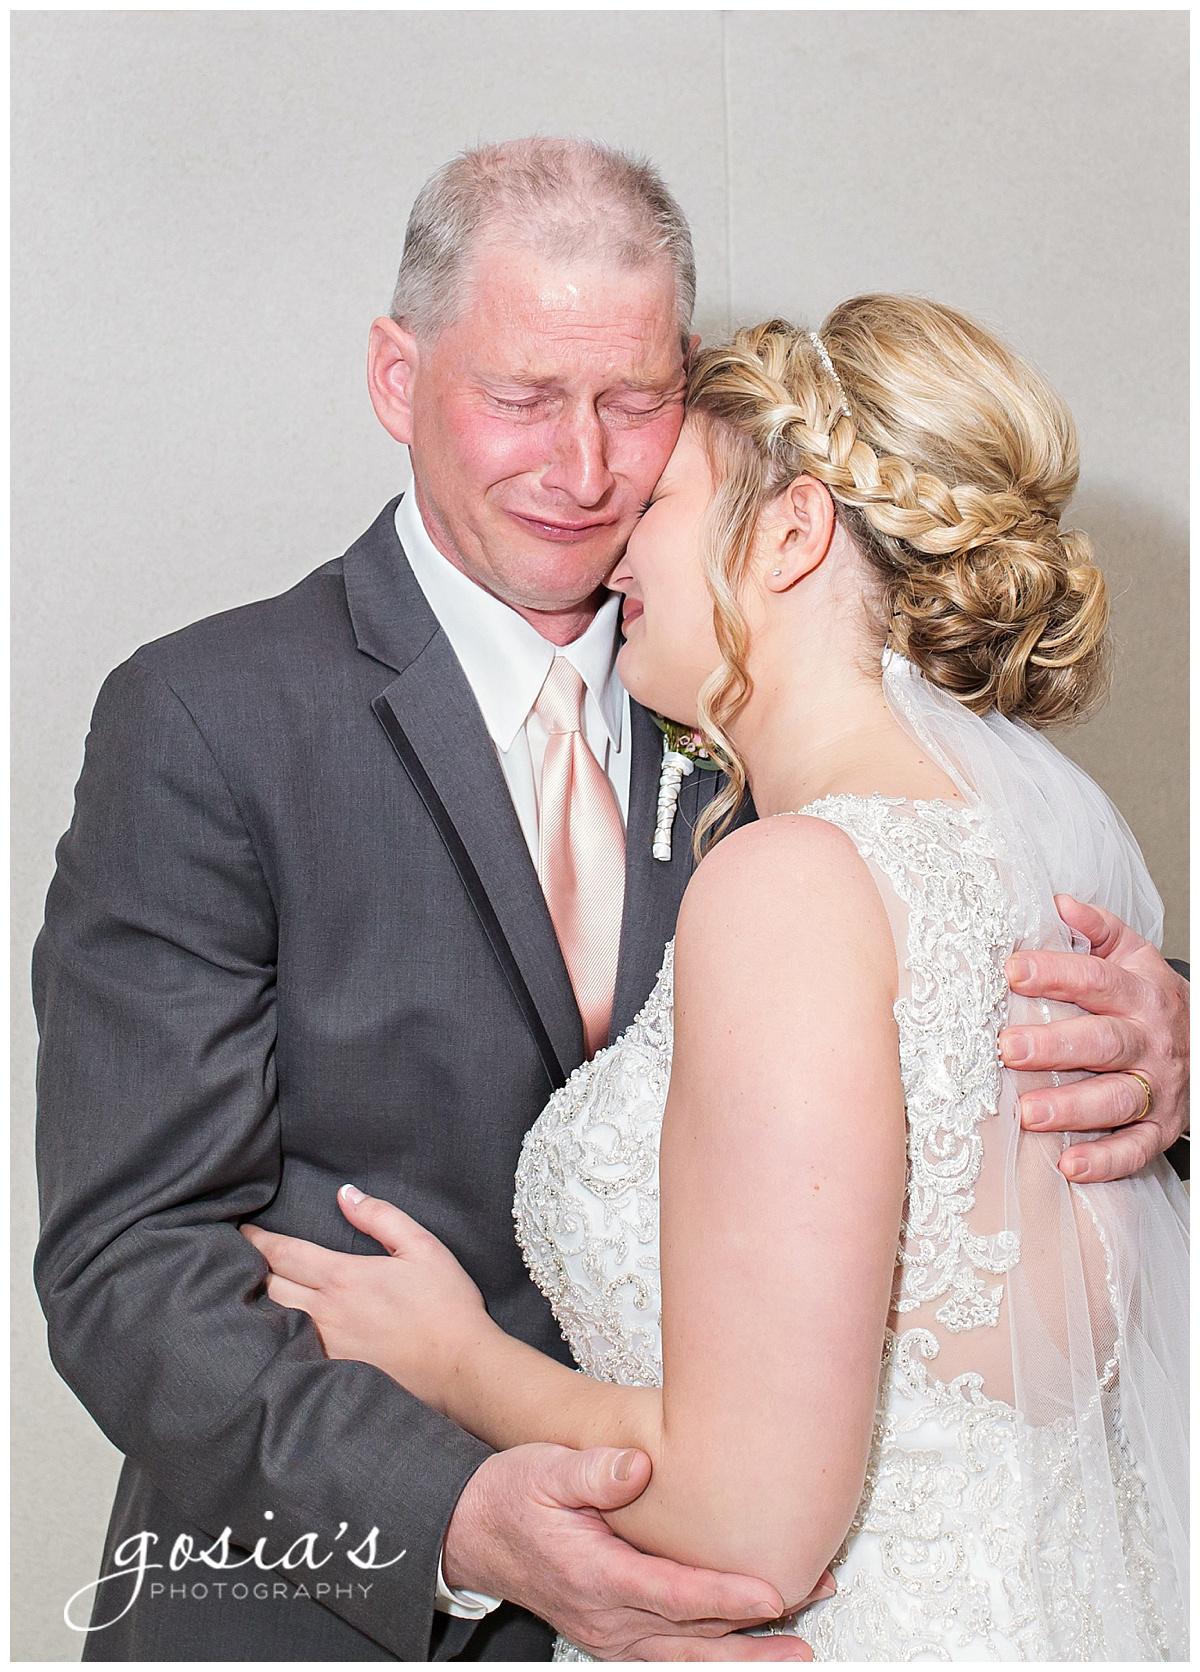 Gosias-Photography-Appleton-wedding-photographer-Fond-du-Lac-ceremony-Holiday-Inn-reception-Shelby-Ryan-_0007.jpg